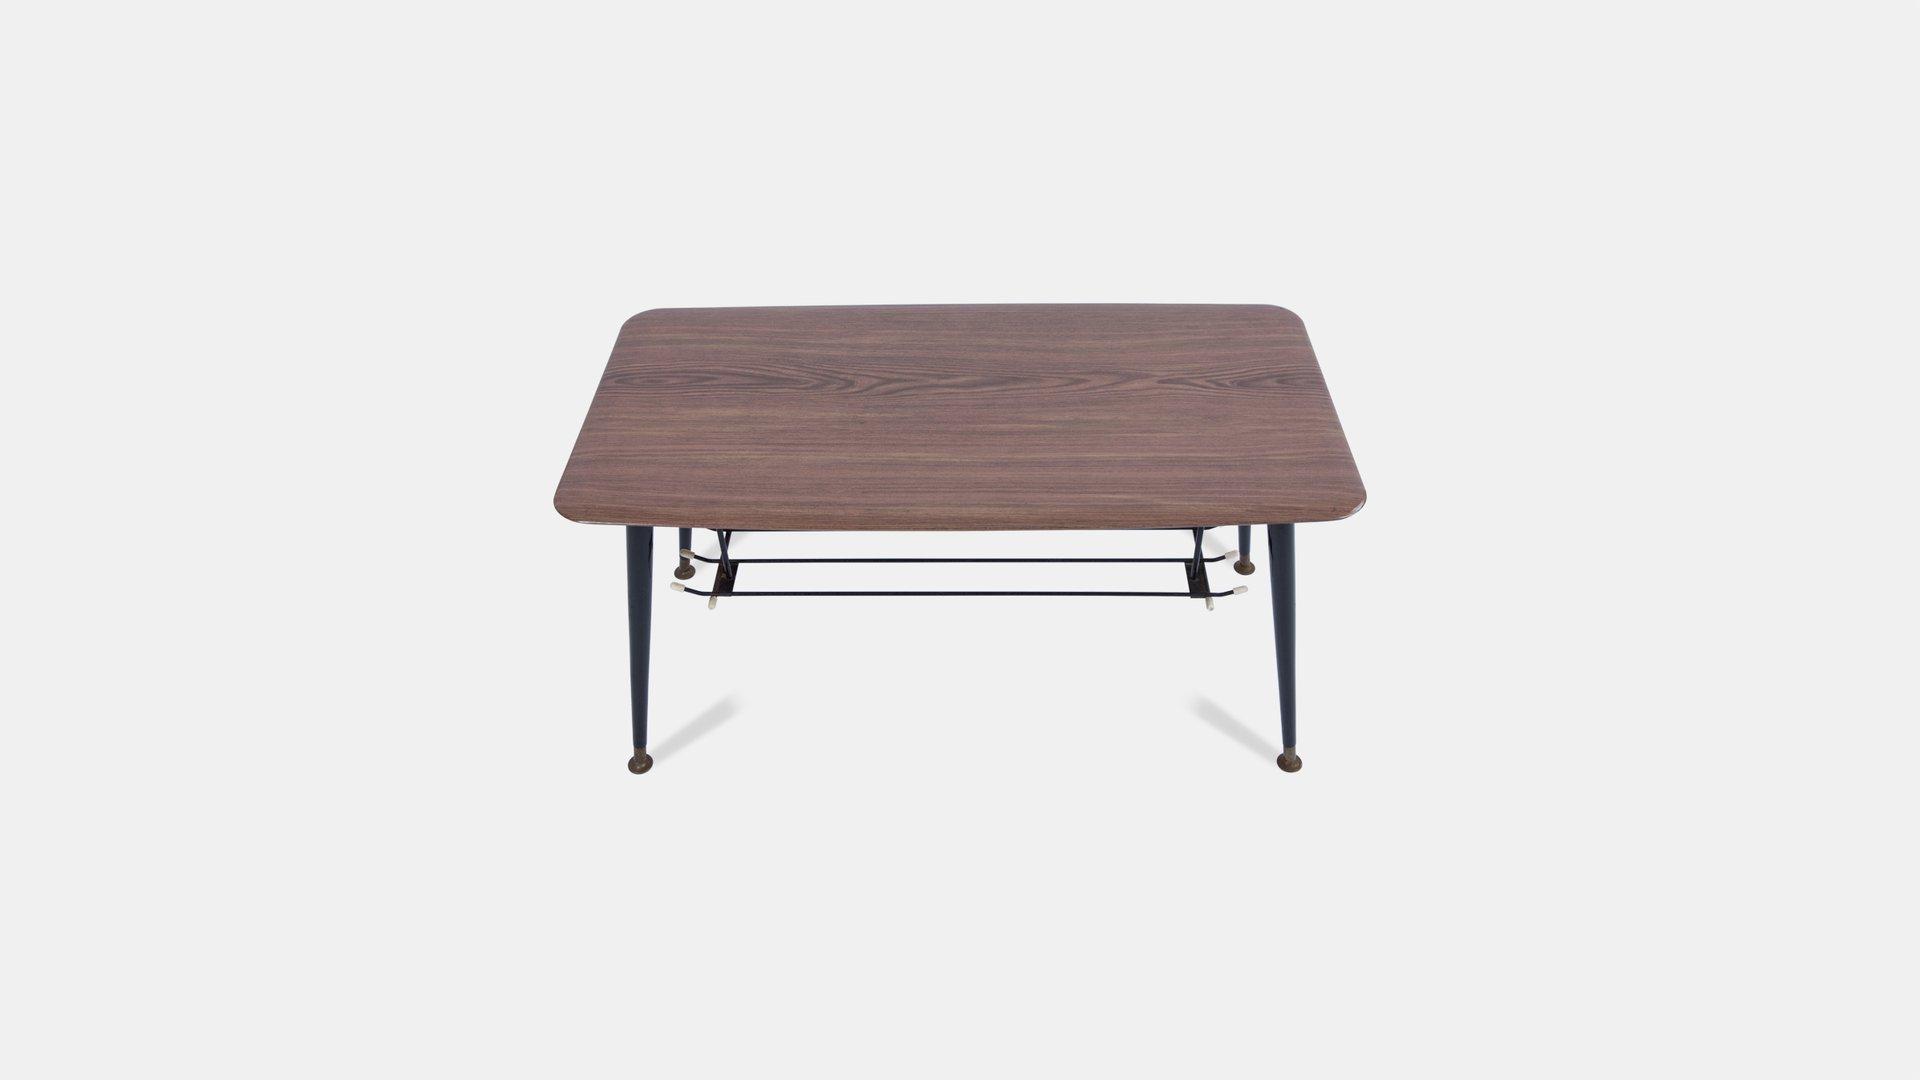 table basse en pointe 1960s en vente sur pamono. Black Bedroom Furniture Sets. Home Design Ideas